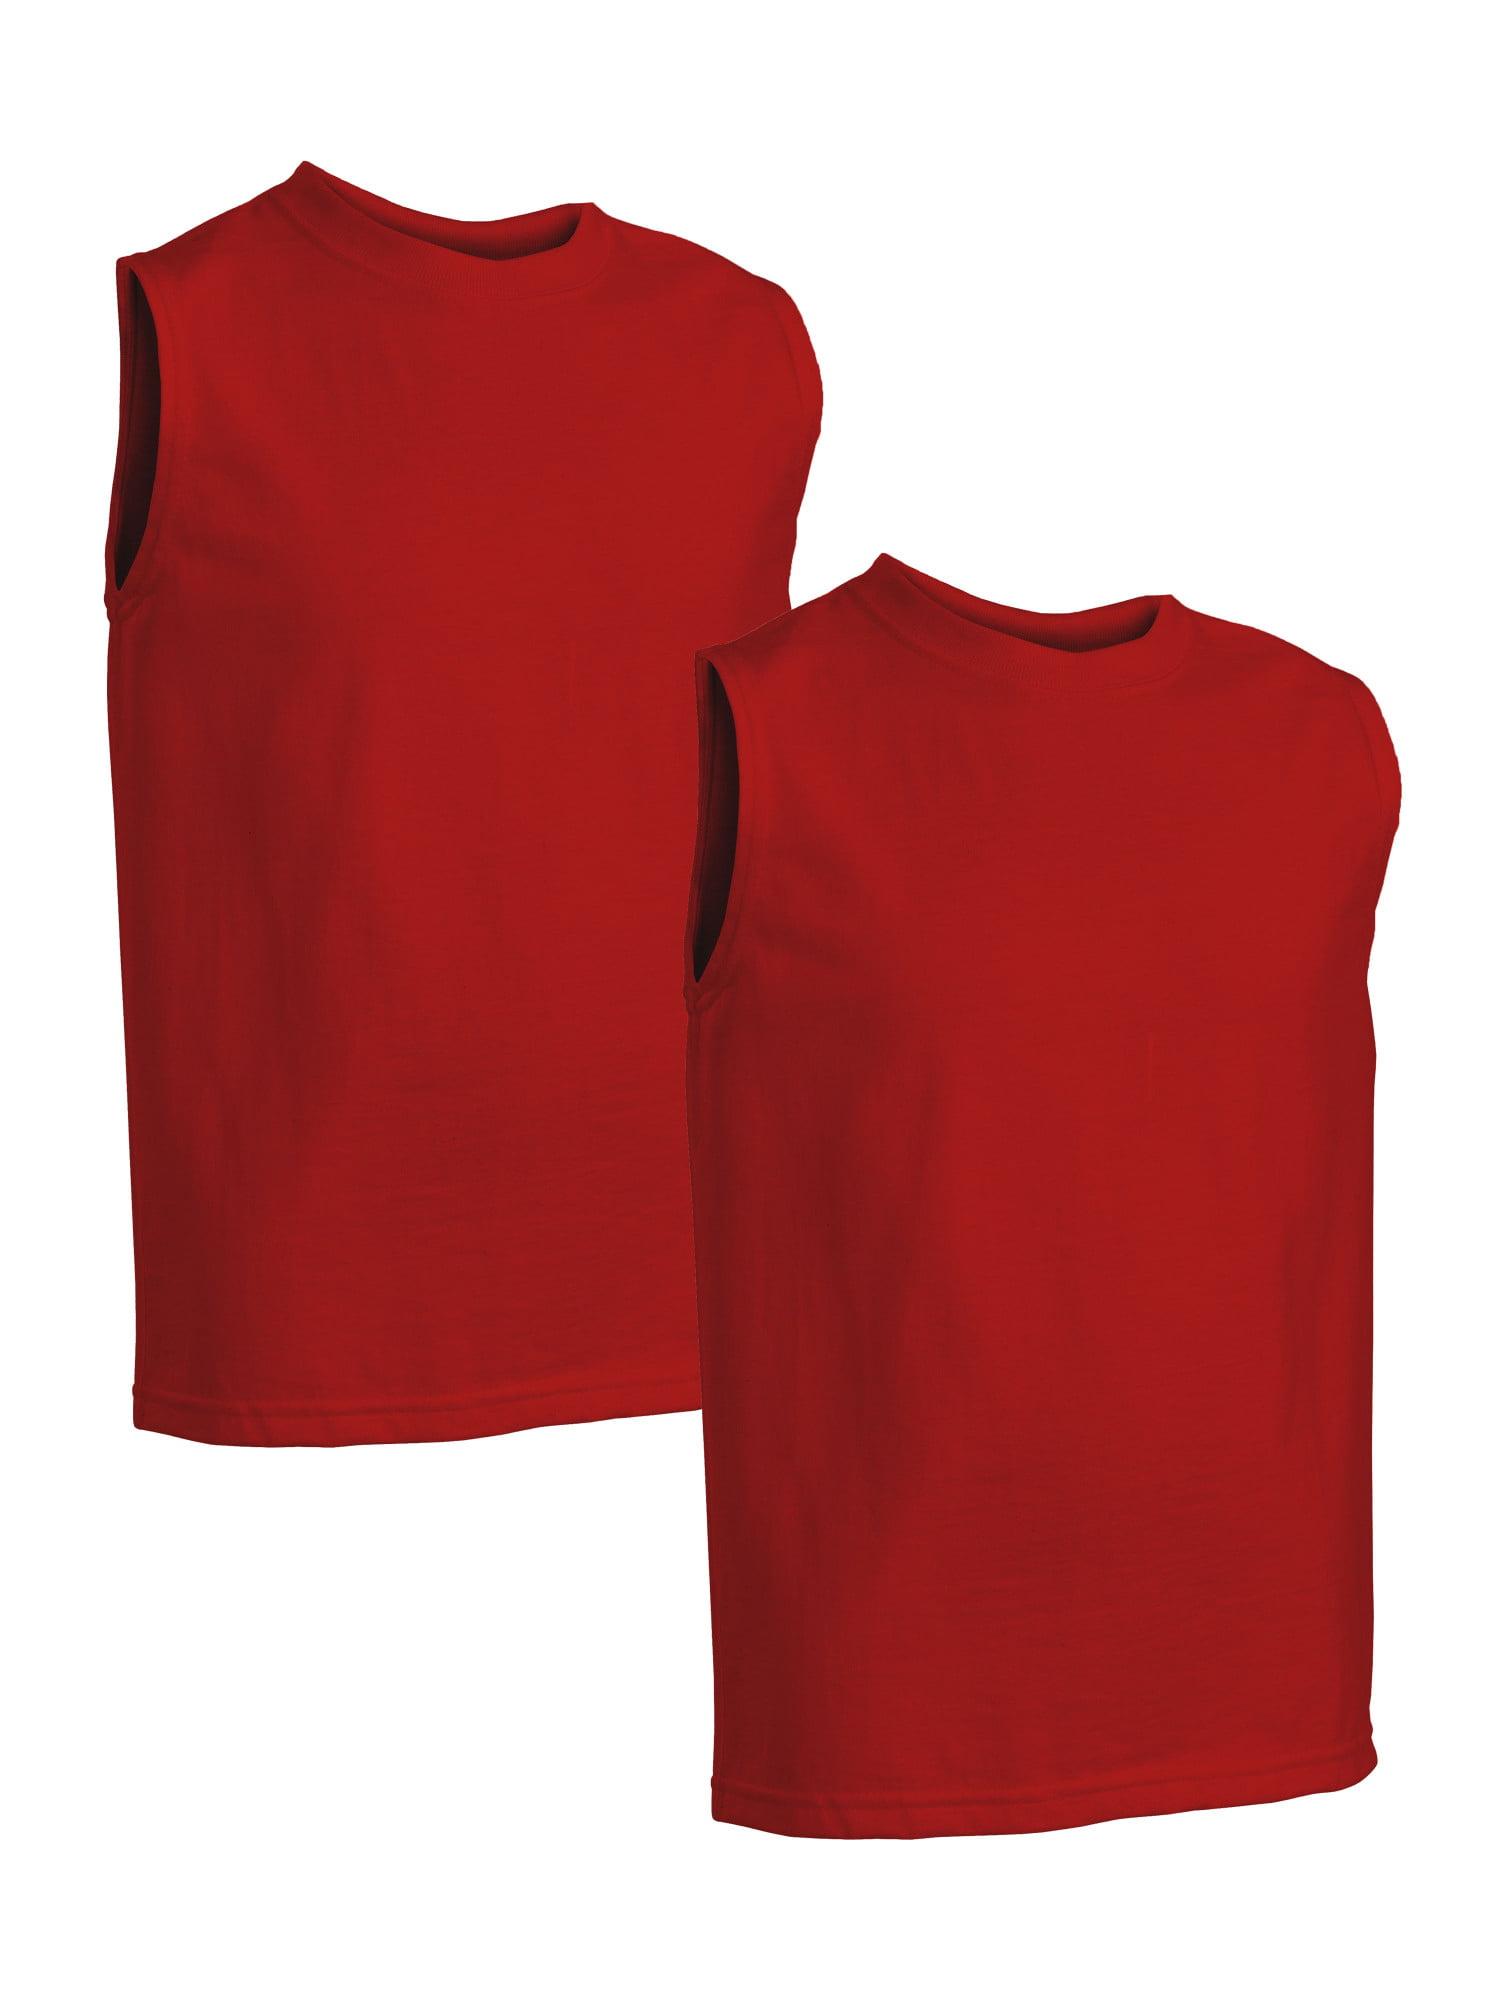 Fruit of the Loom Boys' Hemmed Armhole Sleeveless T-Shirts, 2 Pack